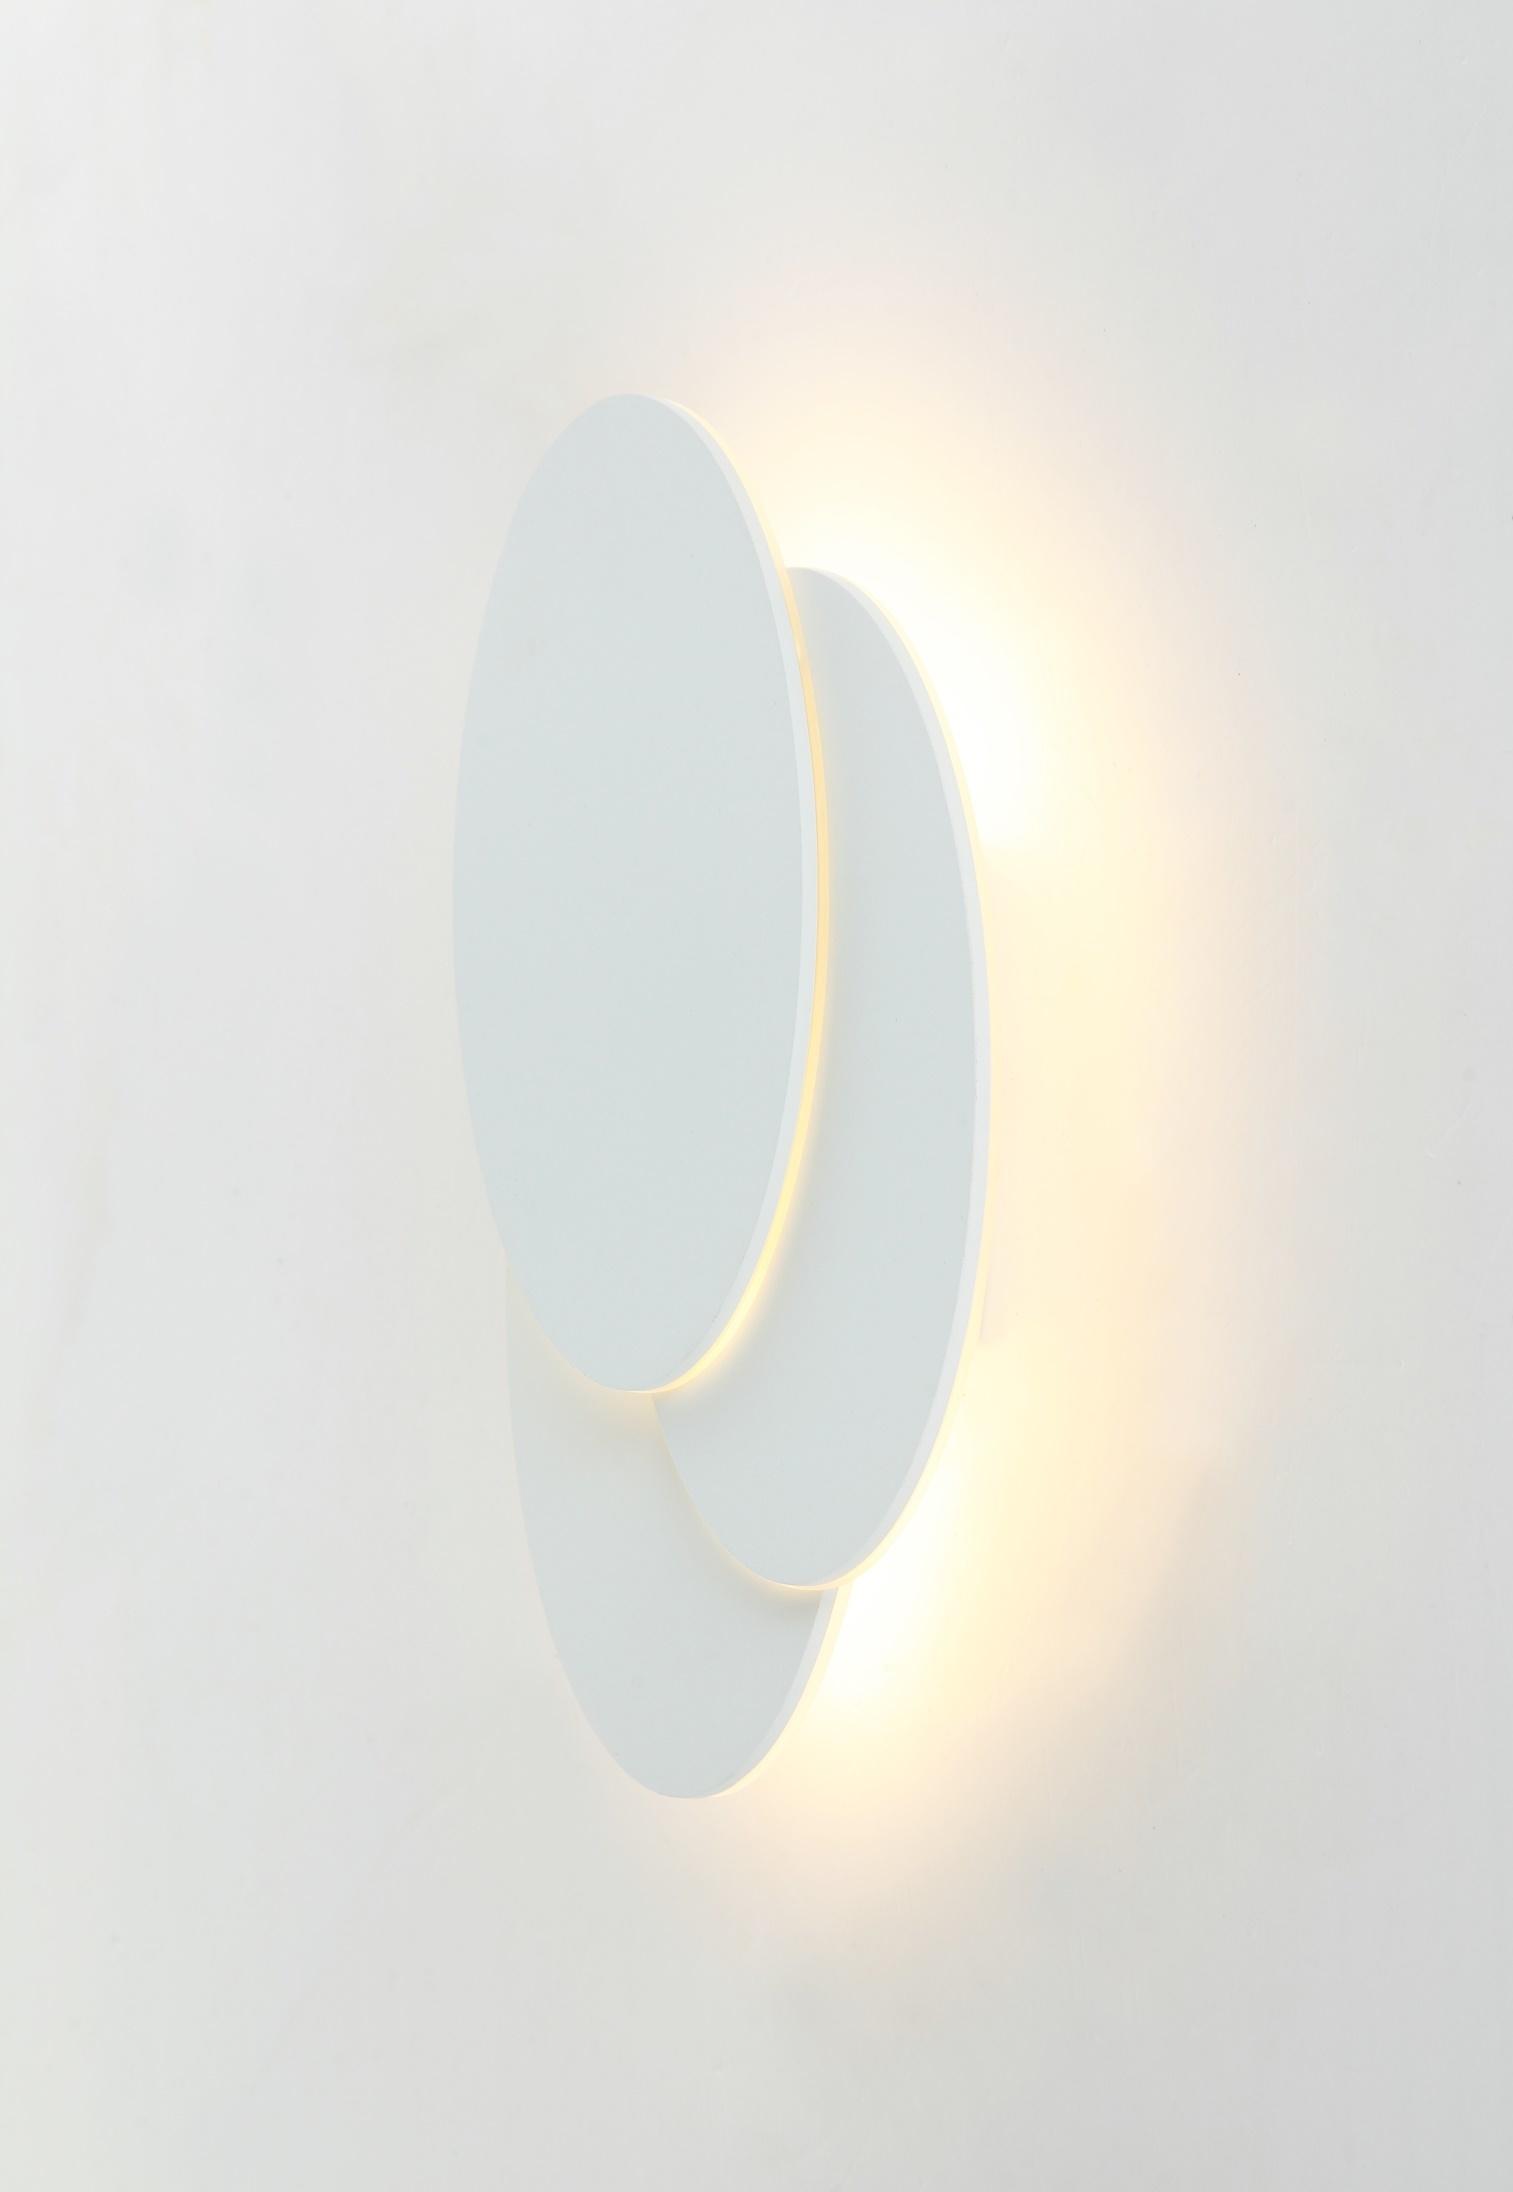 Custom wall lights 12W LED WALL LAMP 63932A-3A With Good Price-Saintly